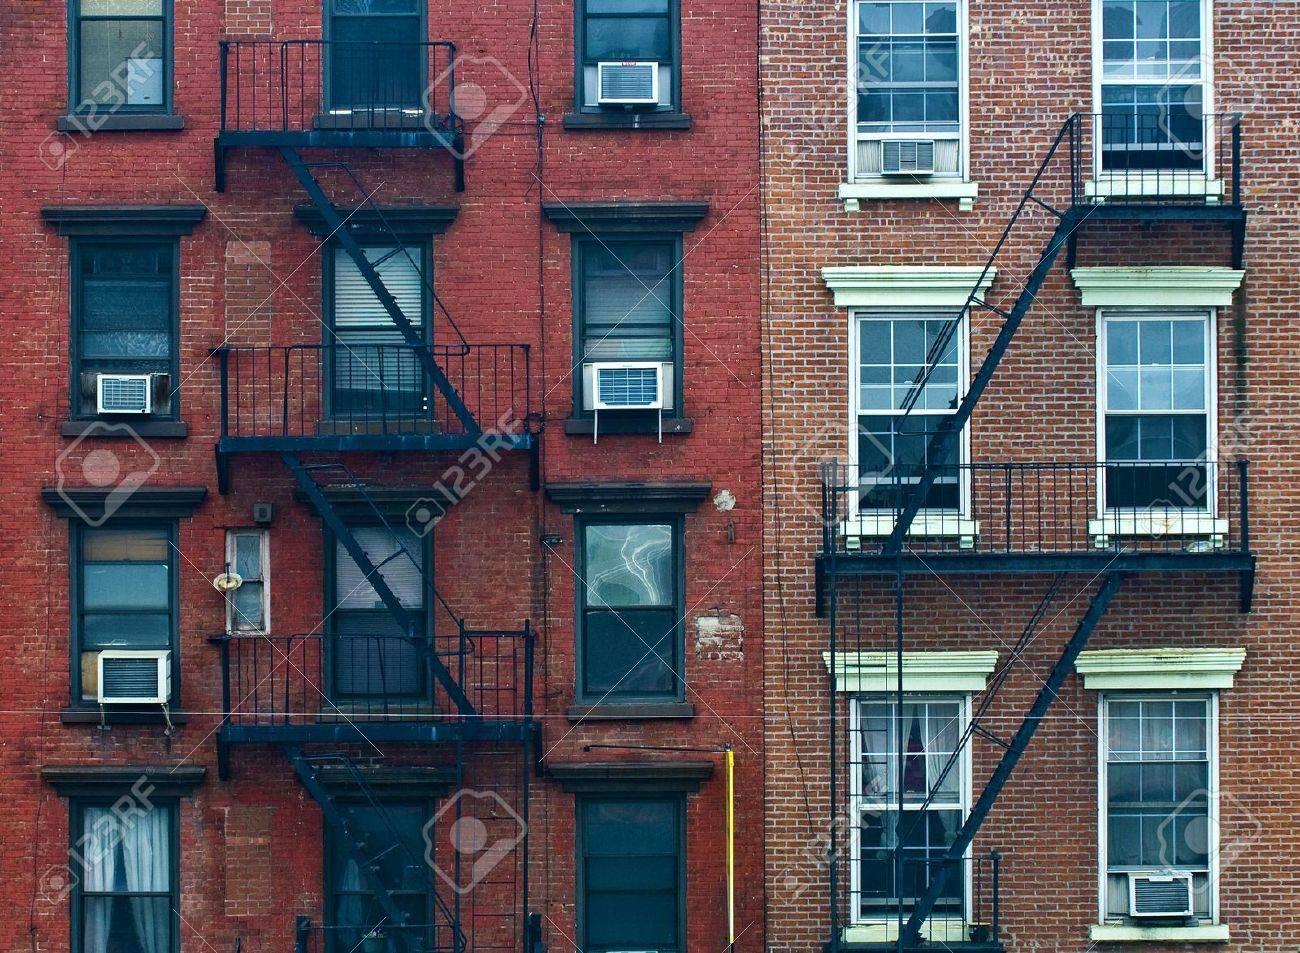 fruitesborrascom 100 New York Apartments Buildings Images The